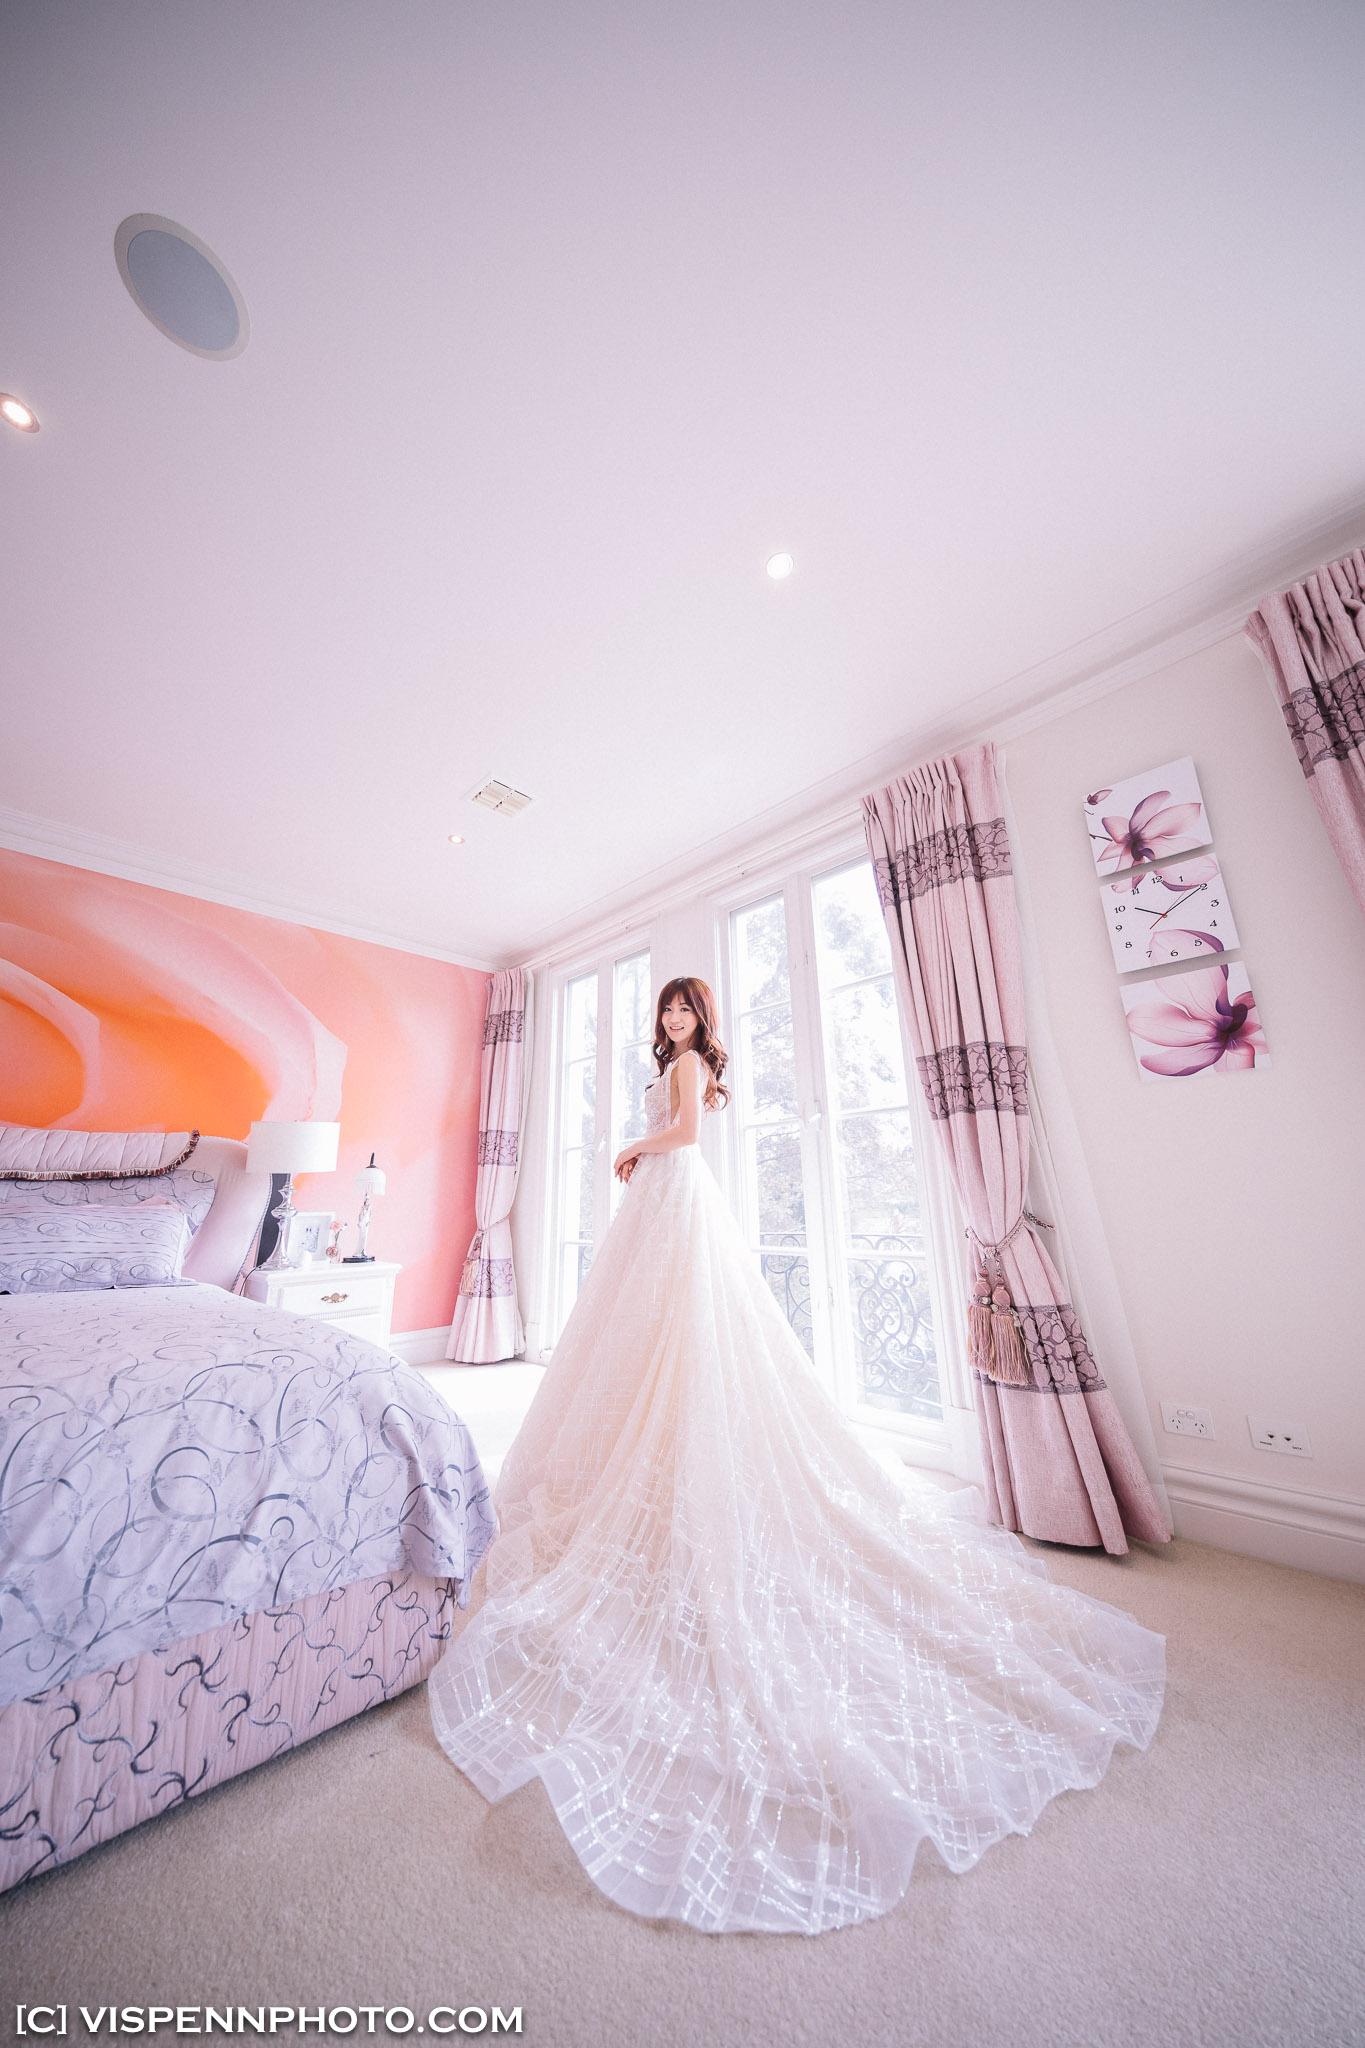 WEDDING DAY Photography Melbourne VISPENN 墨尔本 婚礼跟拍 婚礼摄像 婚礼摄影 结婚照 登记照 VISPENN 0039 5D4 1282